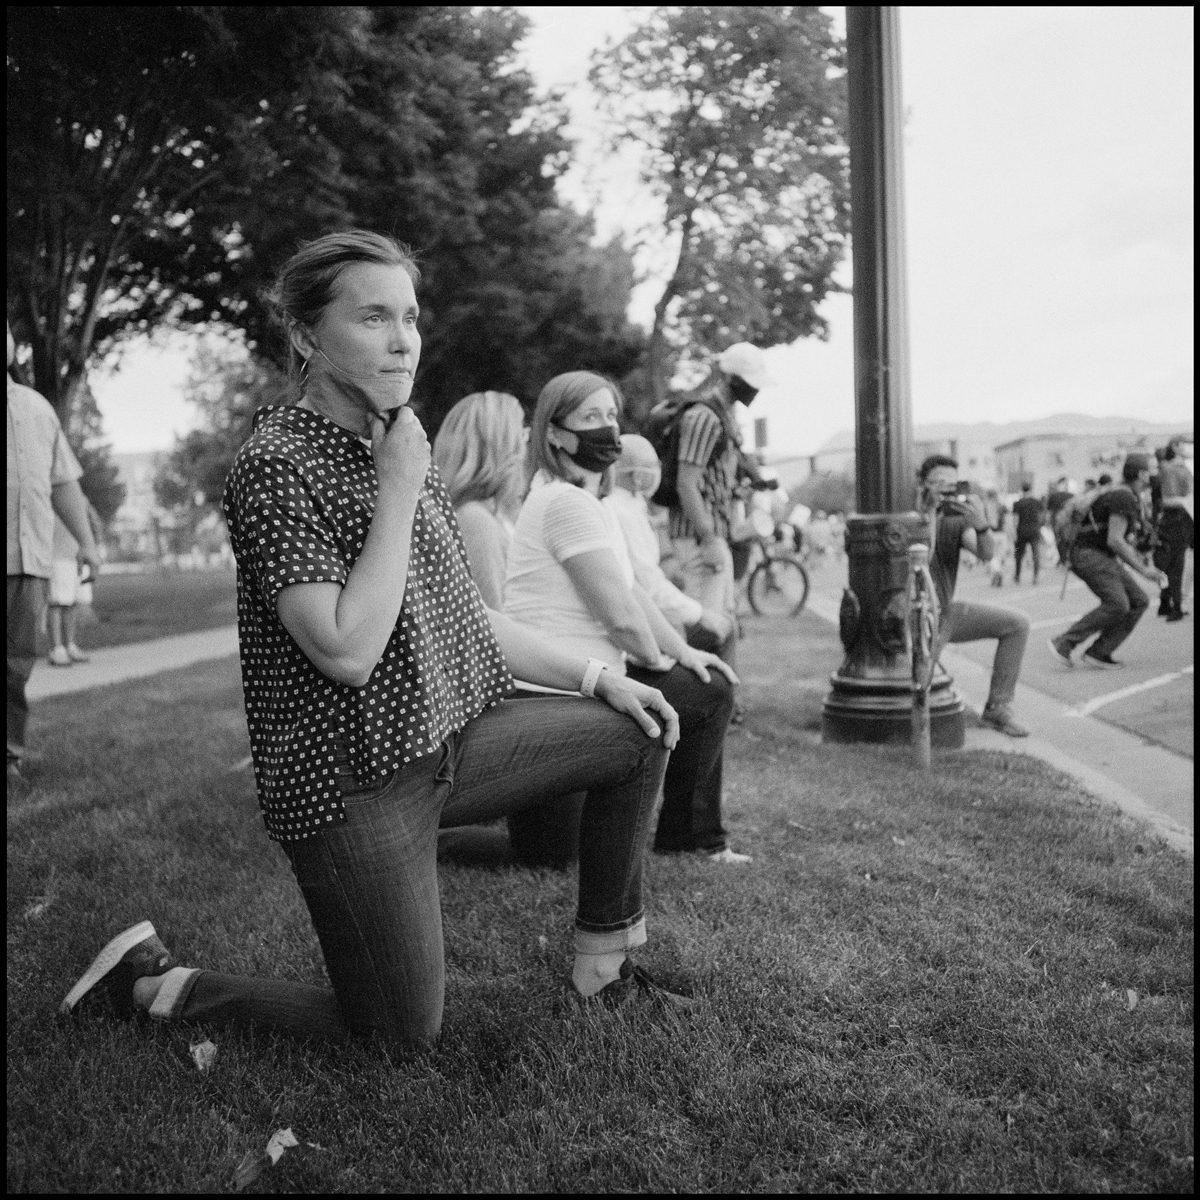 Salt Lake City Mayor, Erin Mendenhall, kneels as protestors march past the county building. Salt Lake City, UT. Ilford Delta 400.